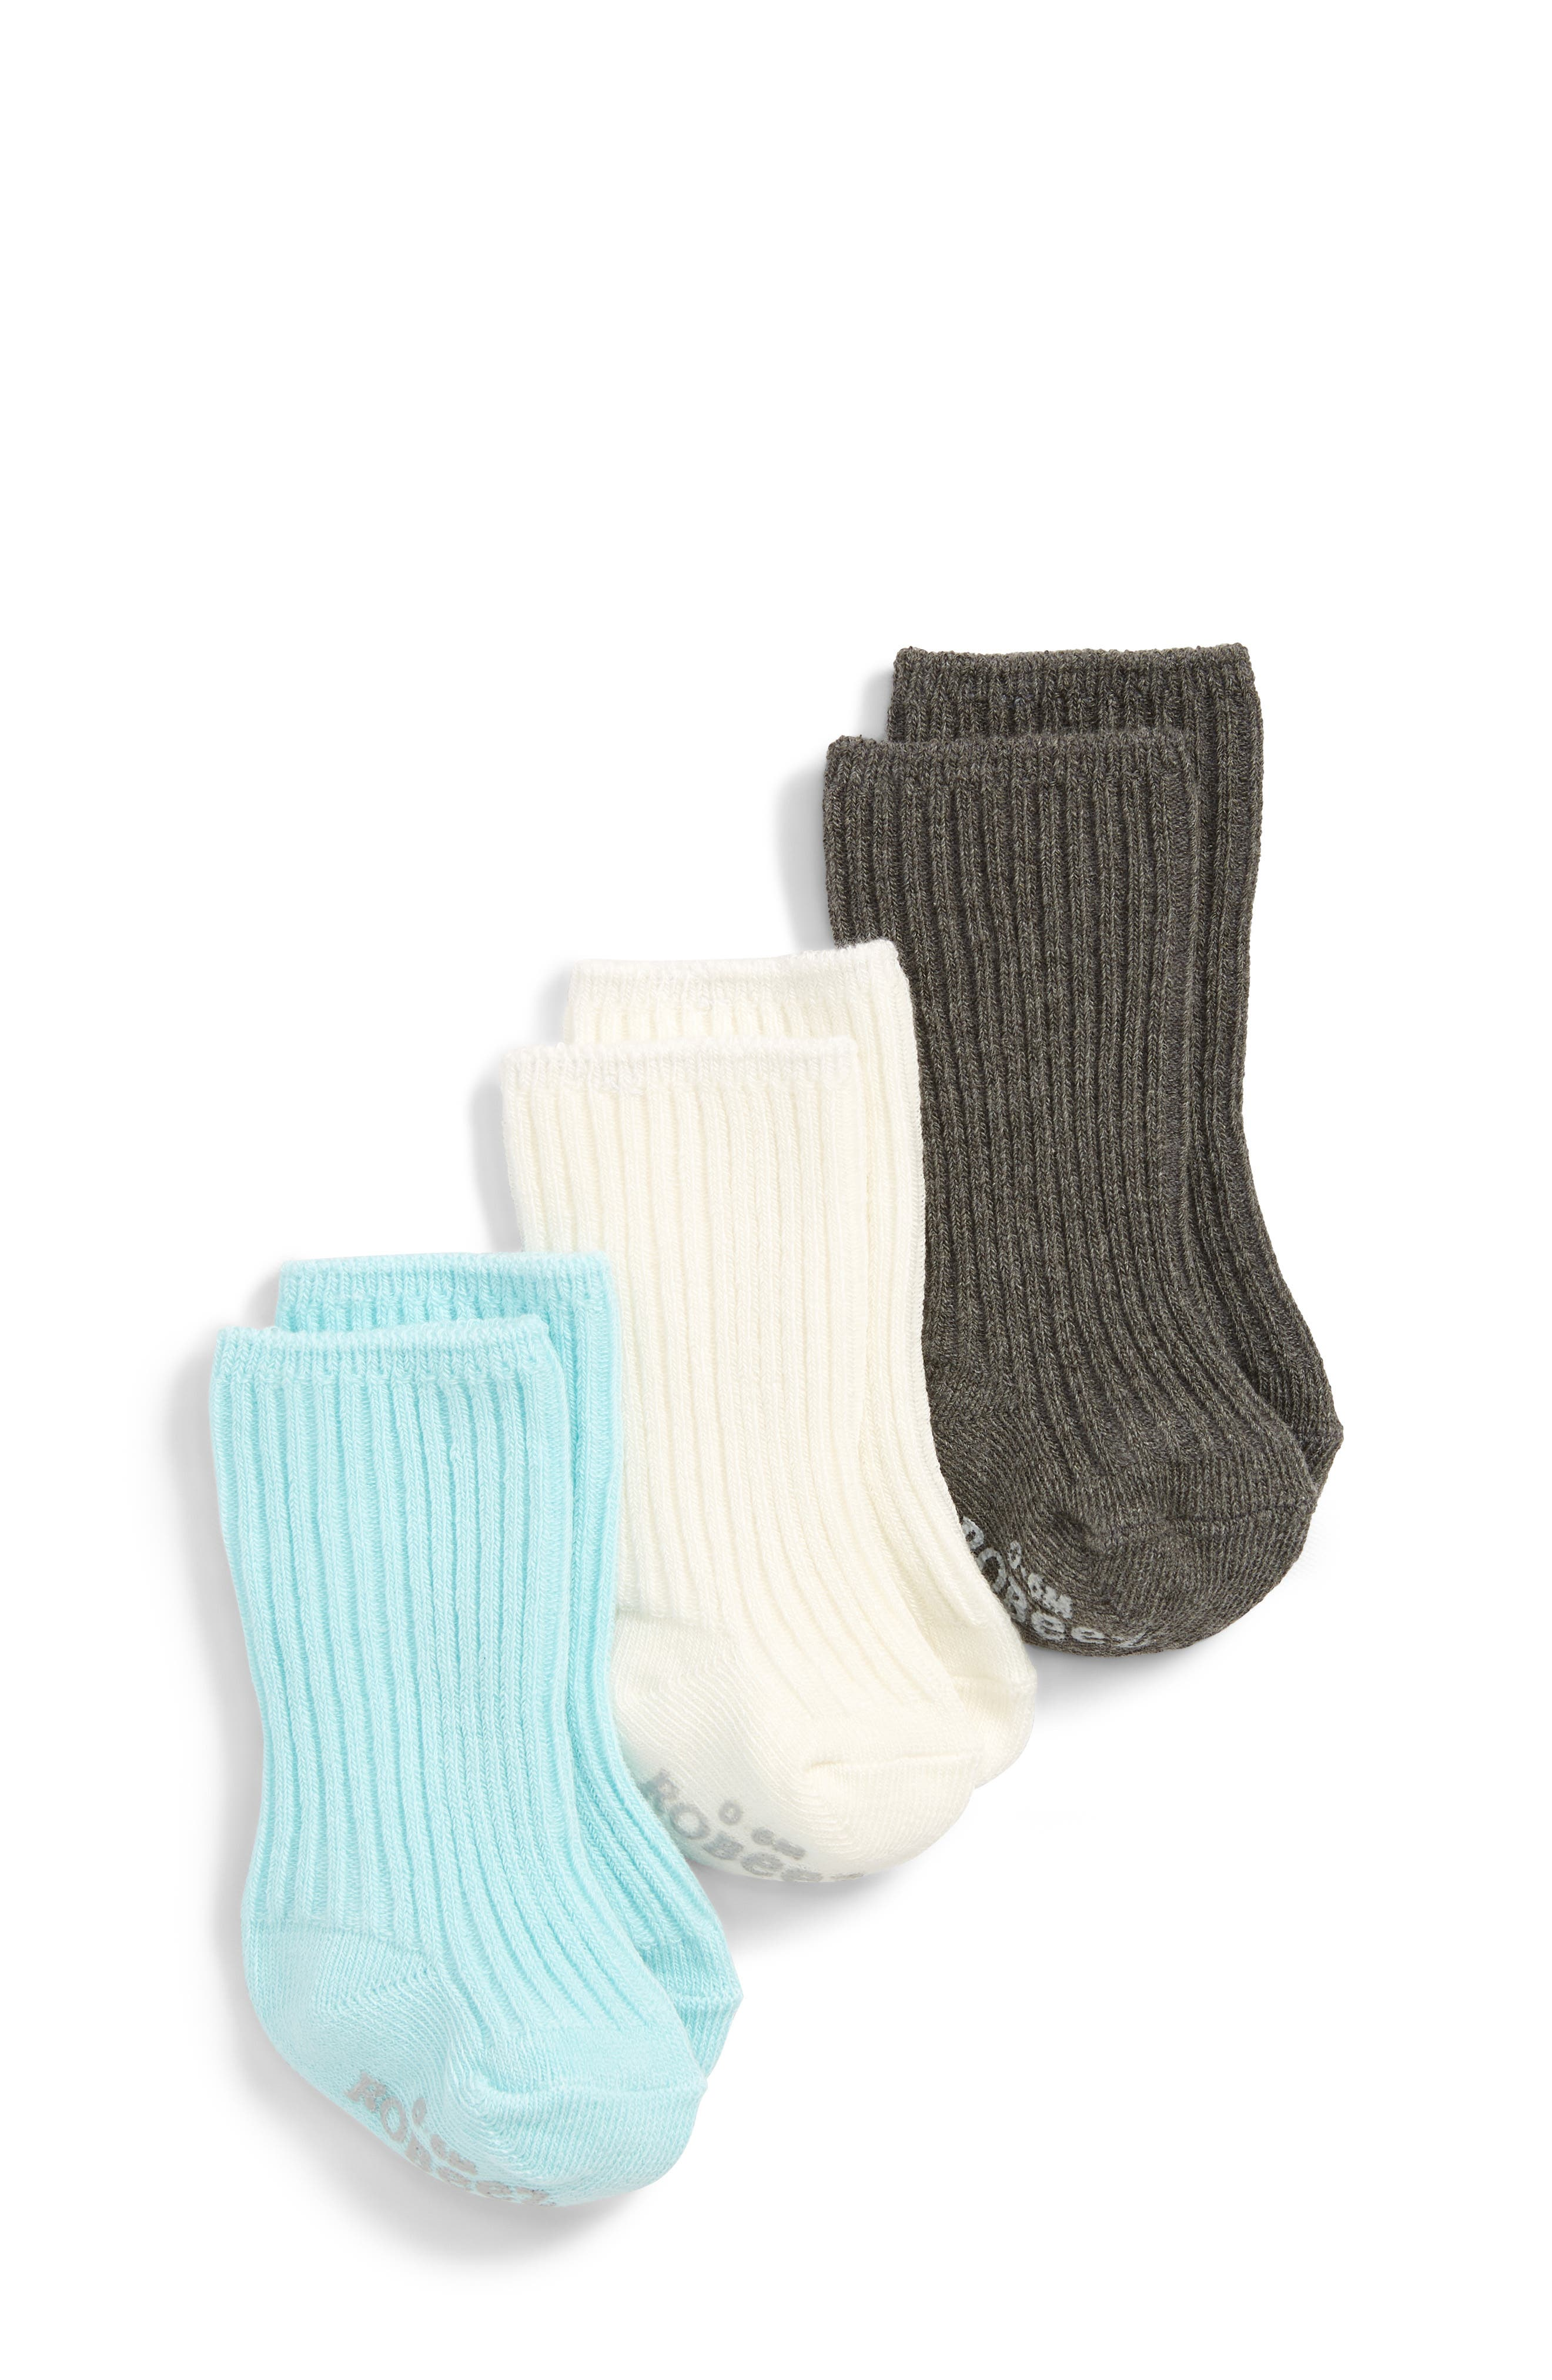 3-Pack Tabitha Basic Socks,                             Main thumbnail 1, color,                             CREAM/ AQUA/ GREY